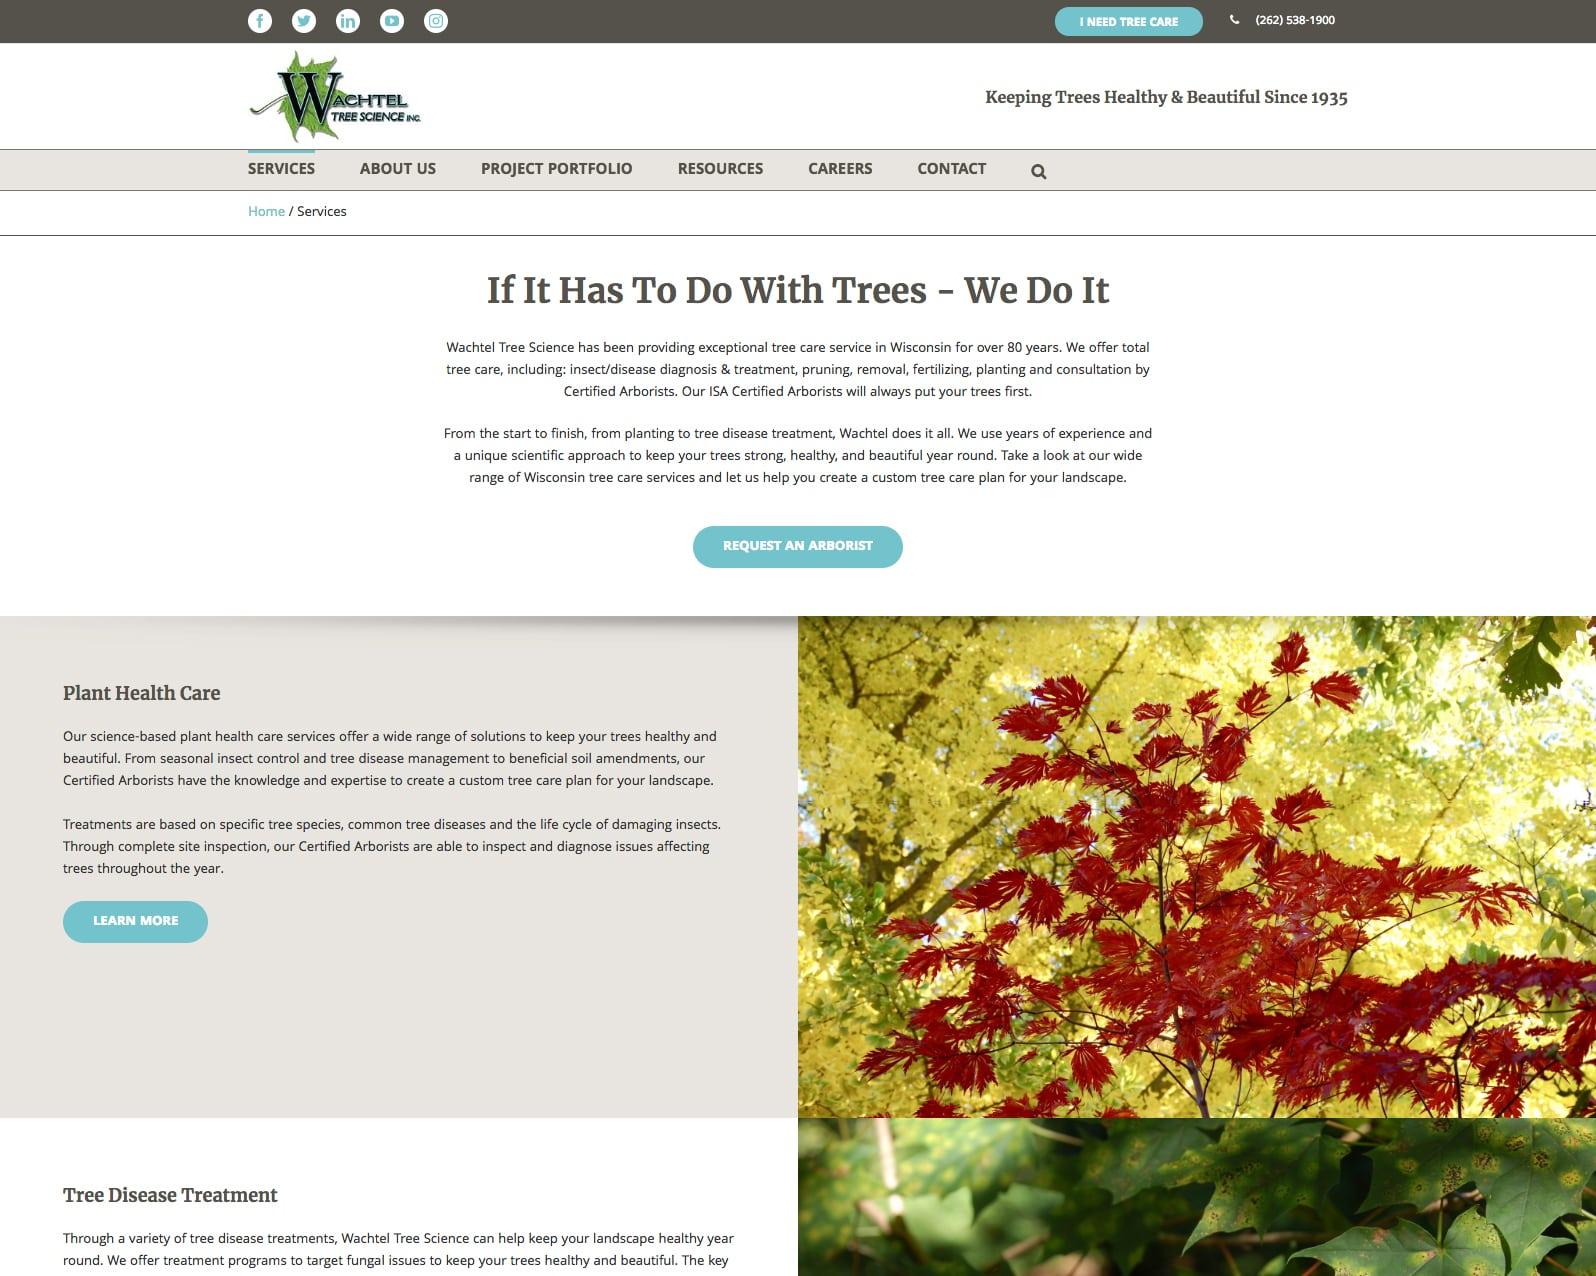 Wachtel service listing webpage